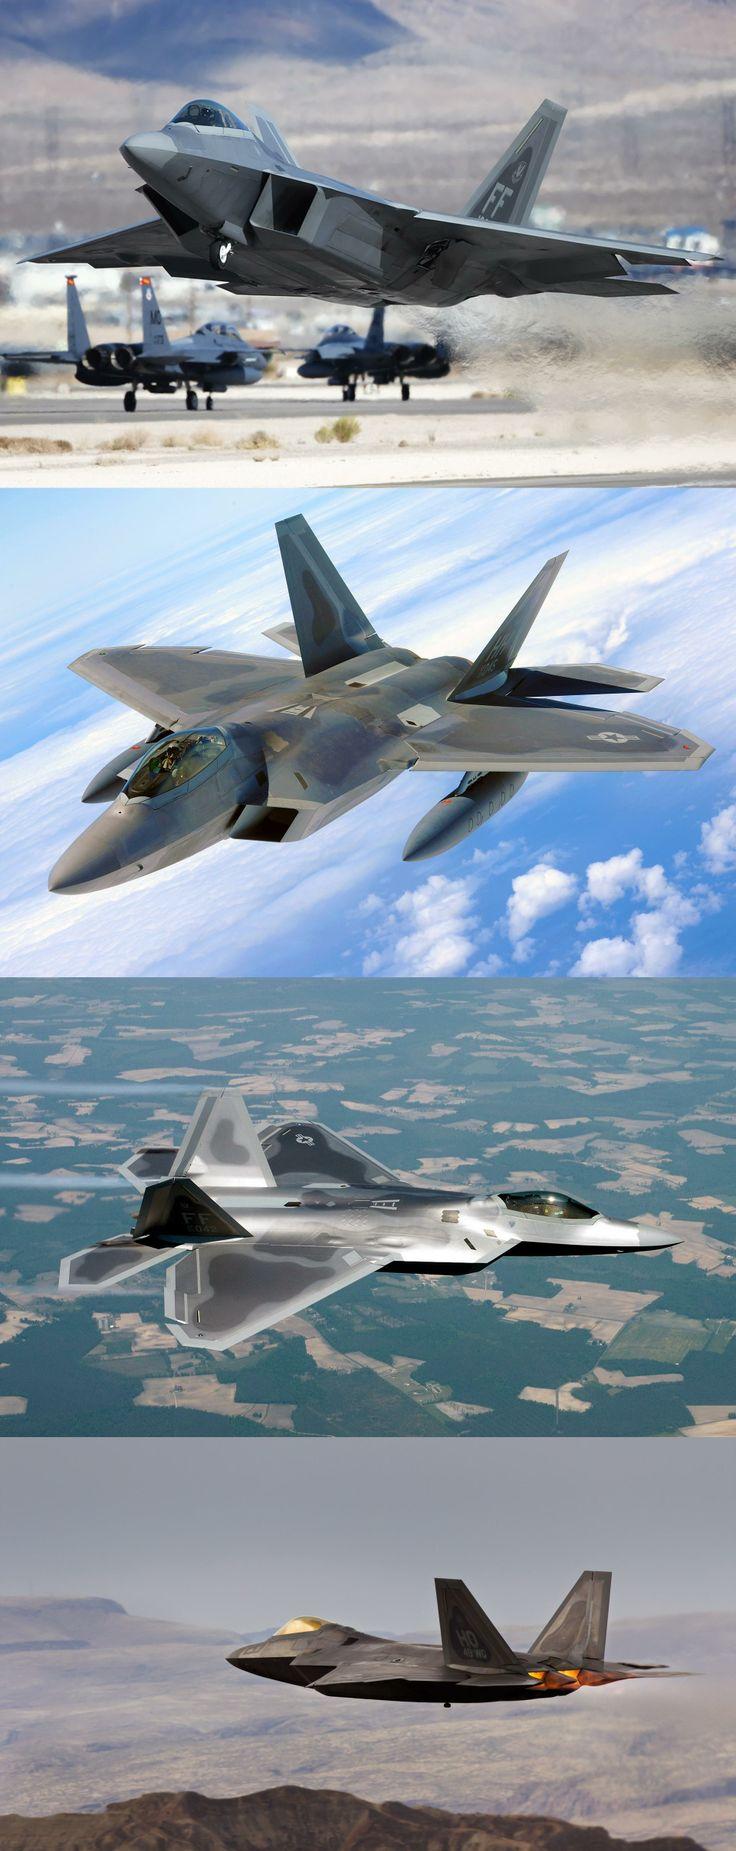 All Types f 22 raptor specs : 37 best Lockheed Martin F-22 Raptor images on Pinterest | Raptors ...